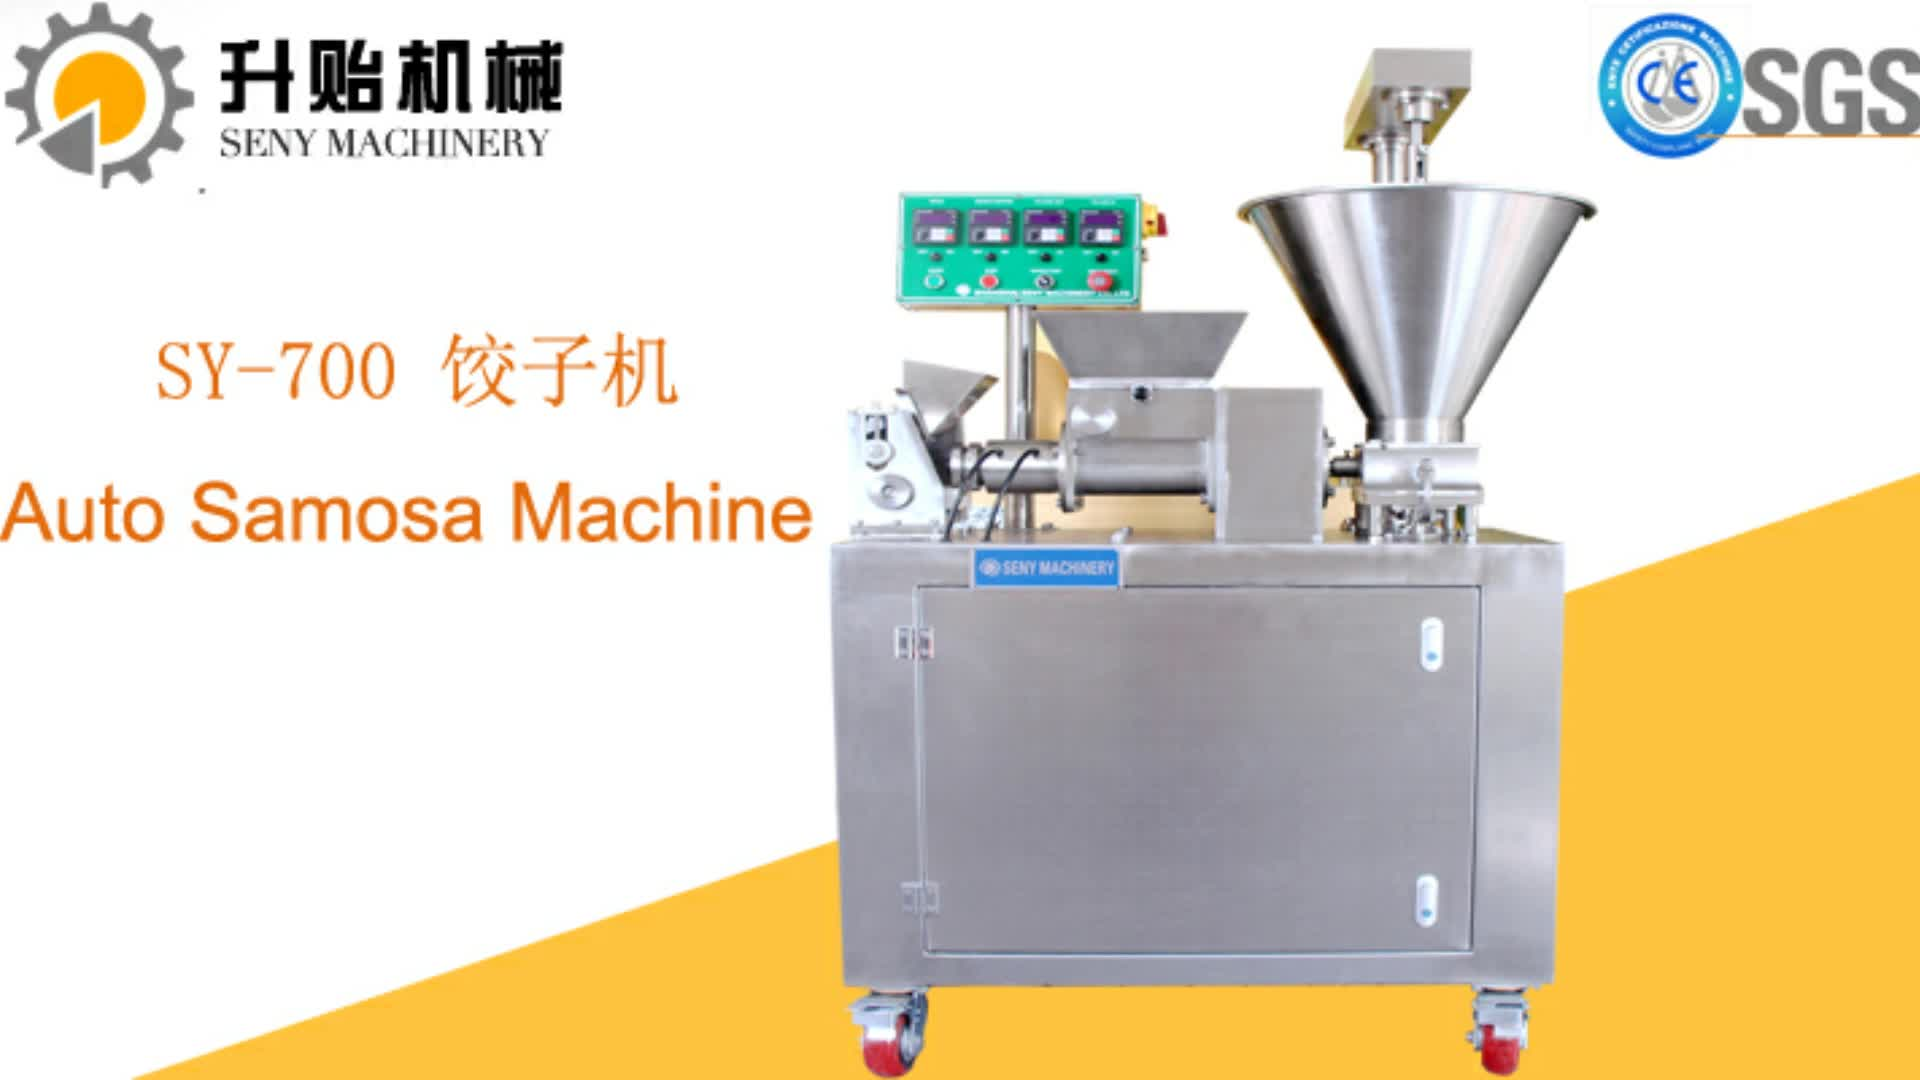 वाणिज्यिक समोसा रैवियोली Empanada बनाने की मशीन